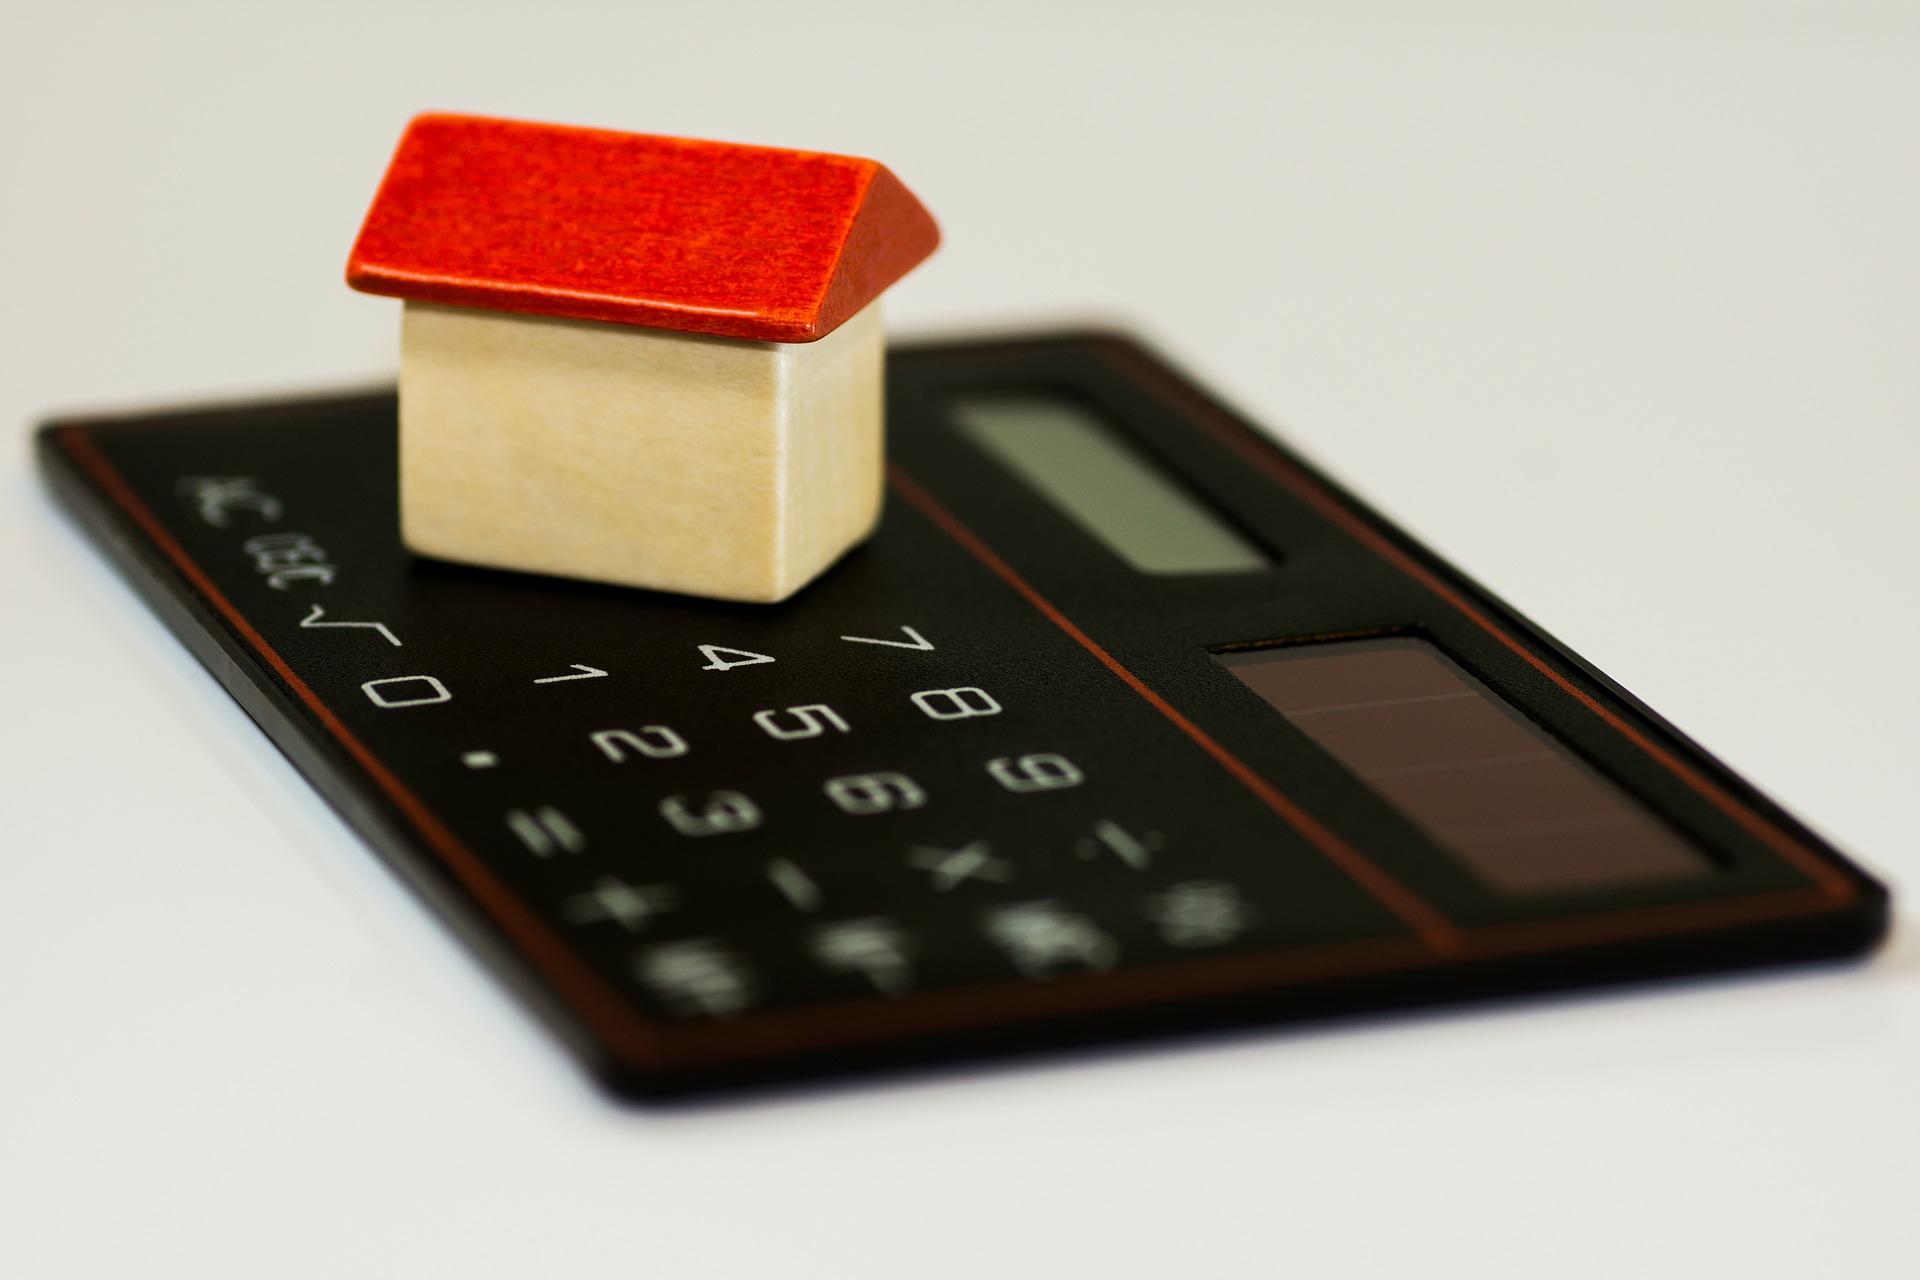 Immobilienbewertung Wohnung Ertragswertverfahren